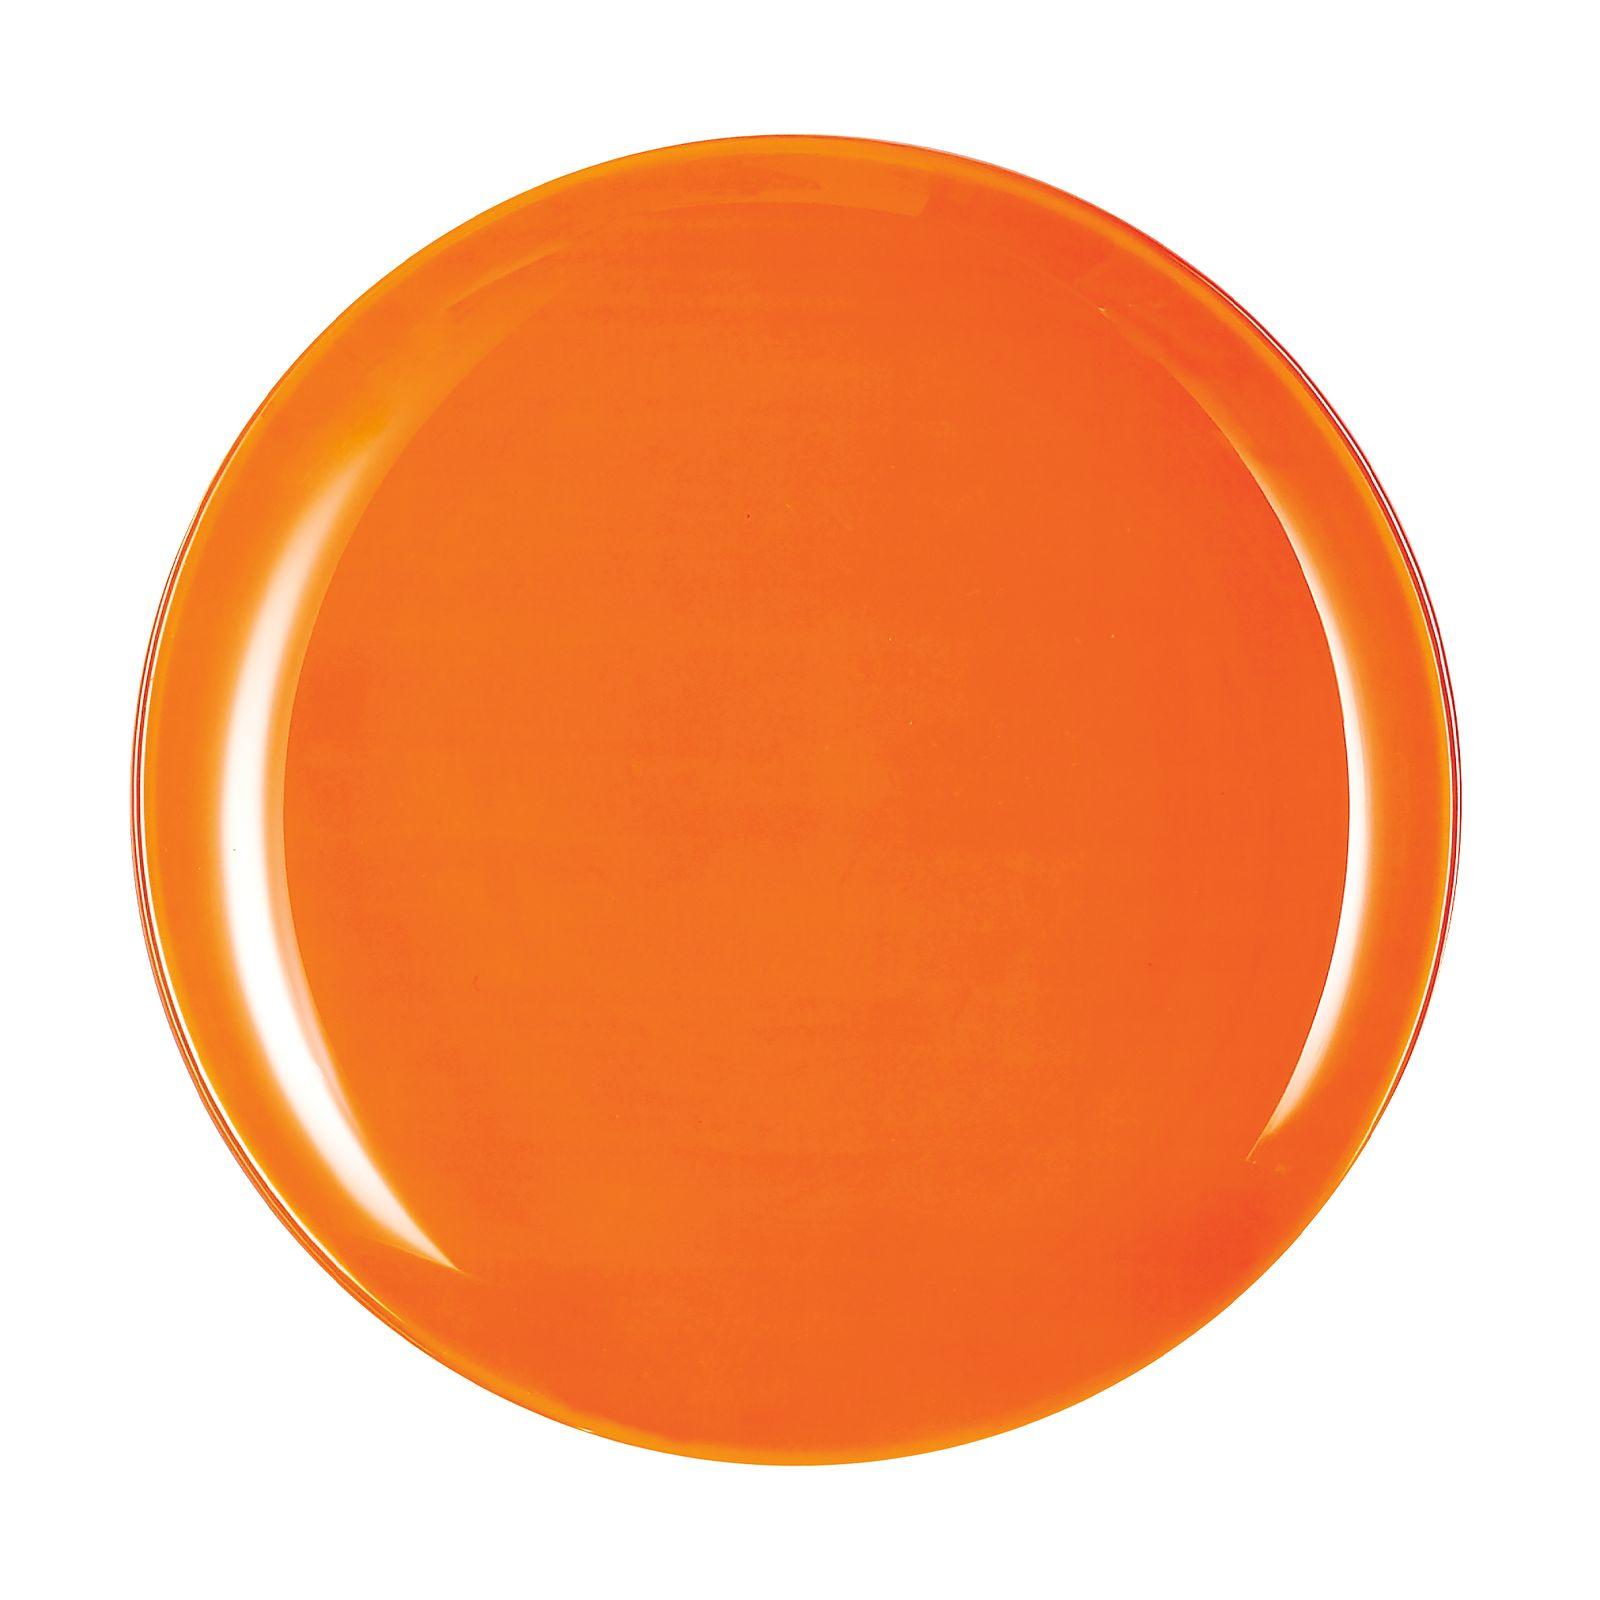 Assiette à dessert Arty Orange 20,5 cm LUMINARC